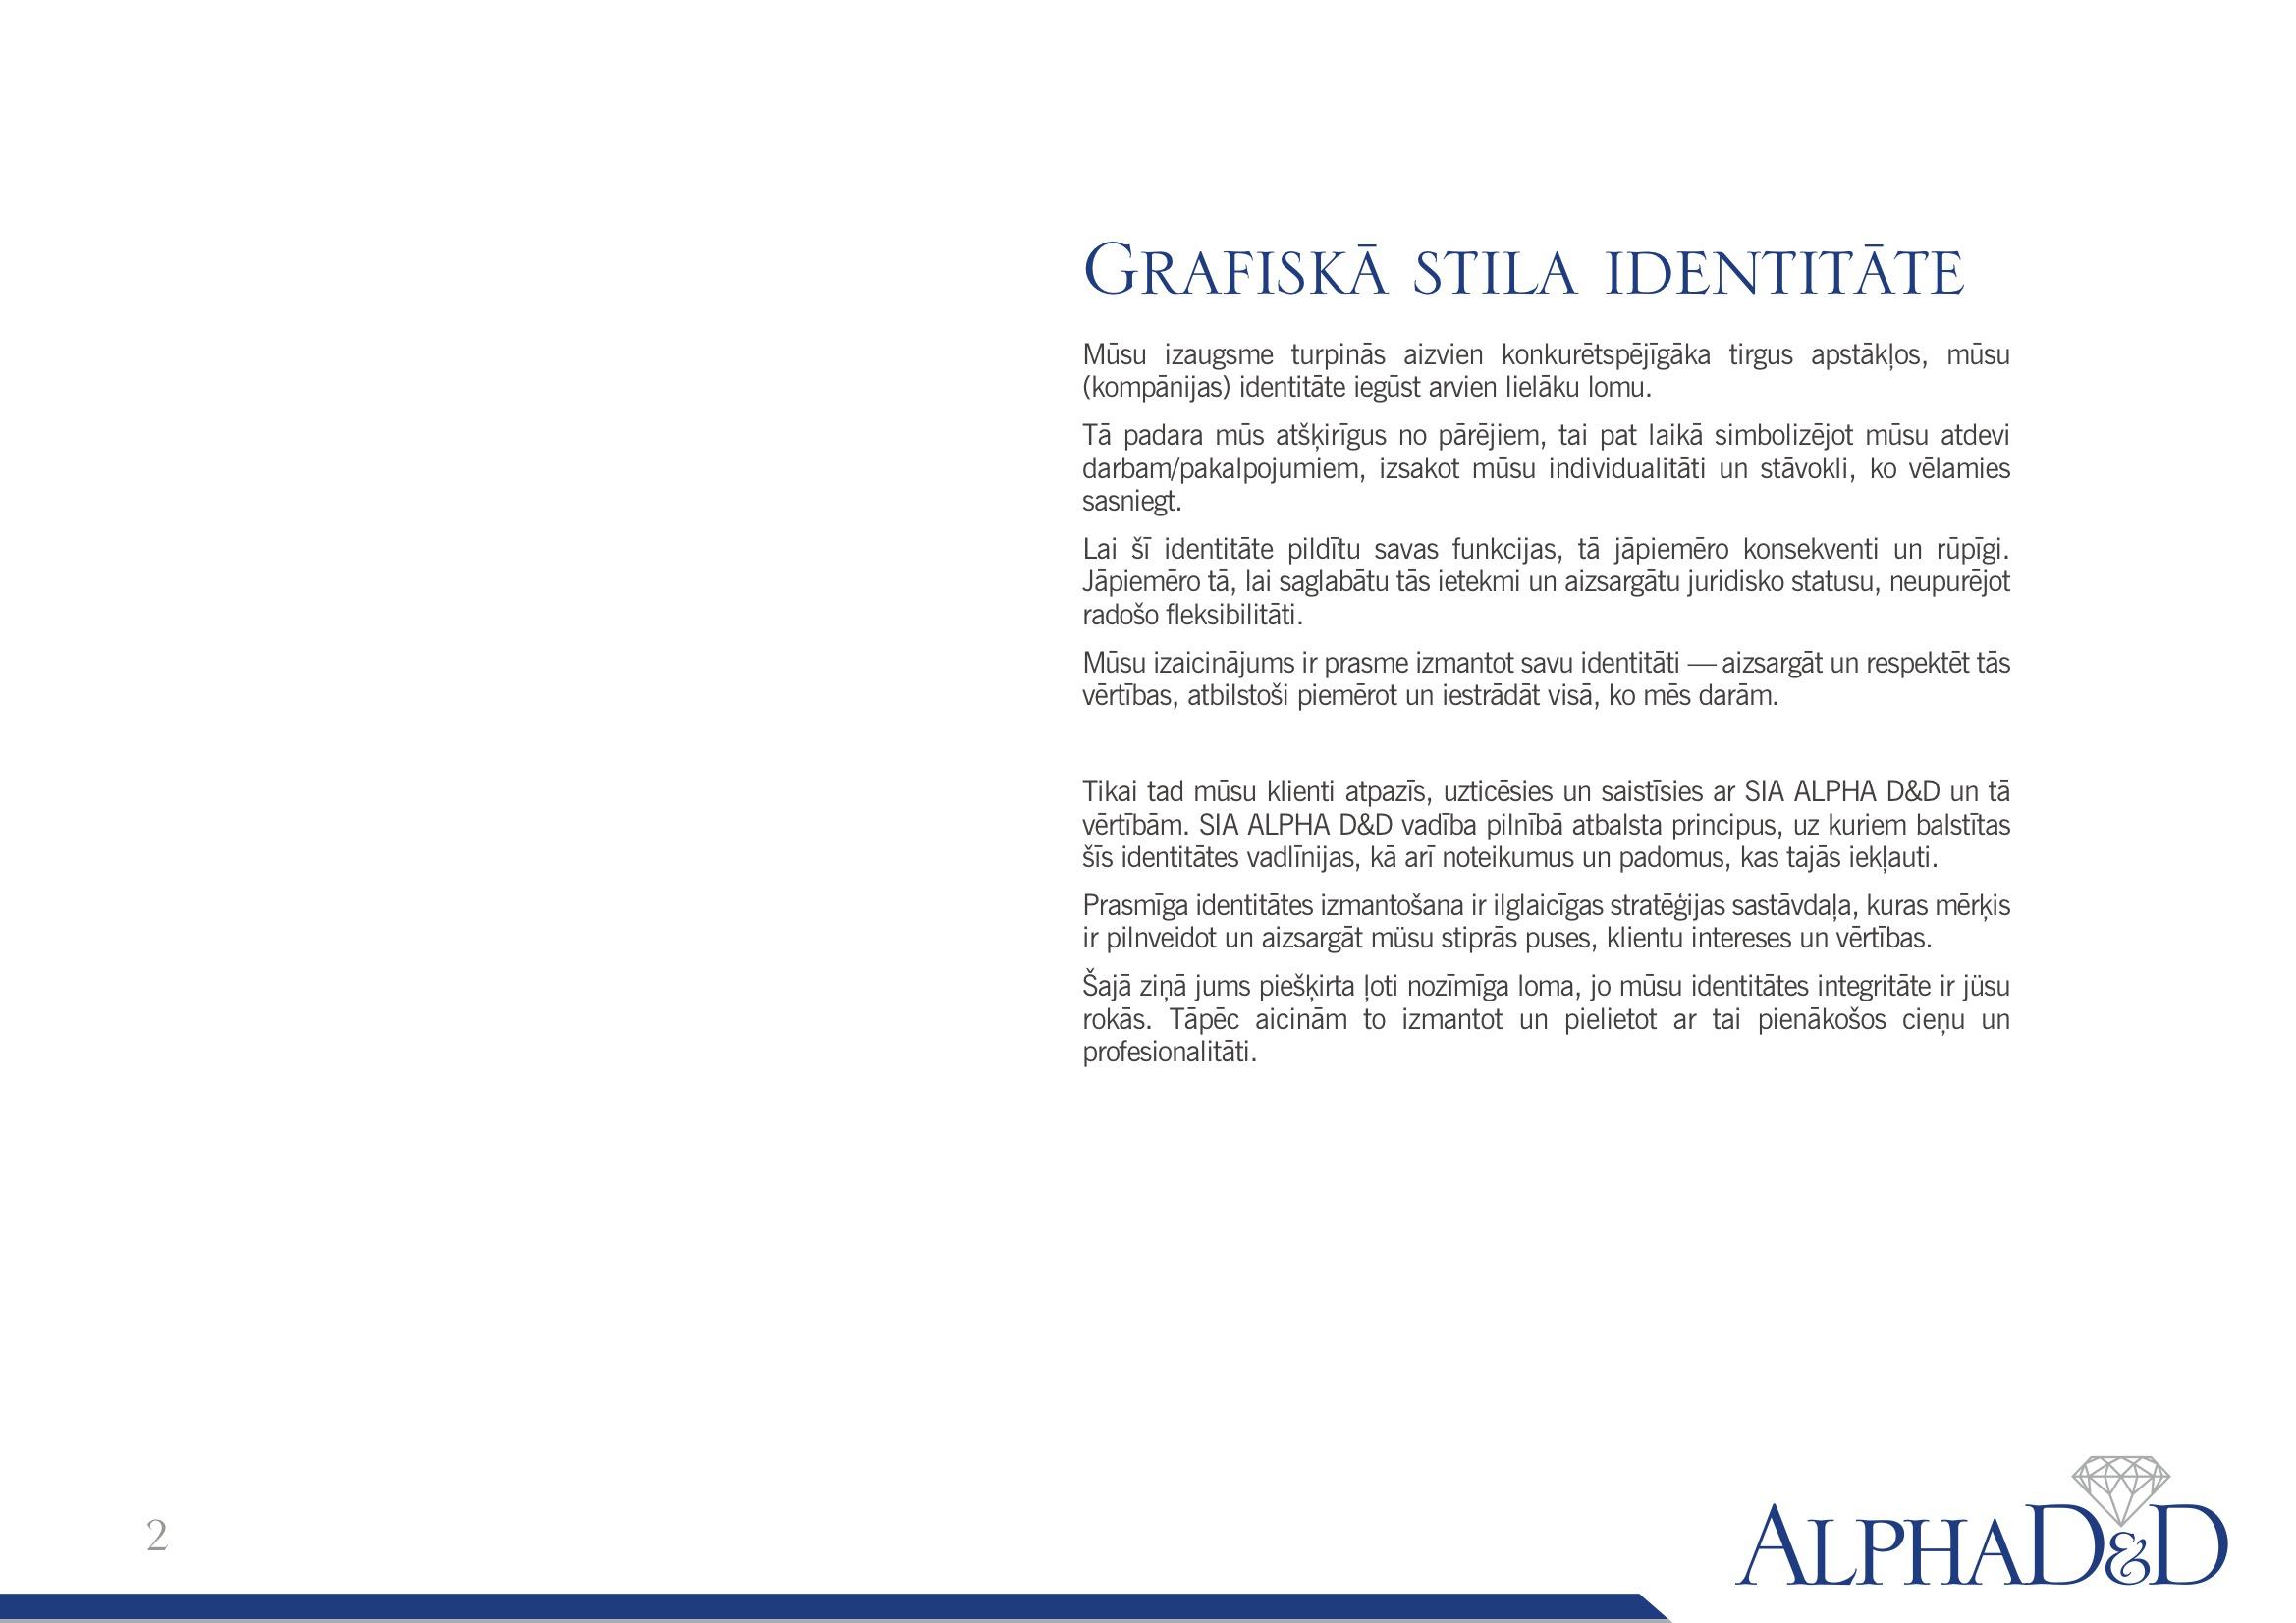 AlphaDD_Stils 2